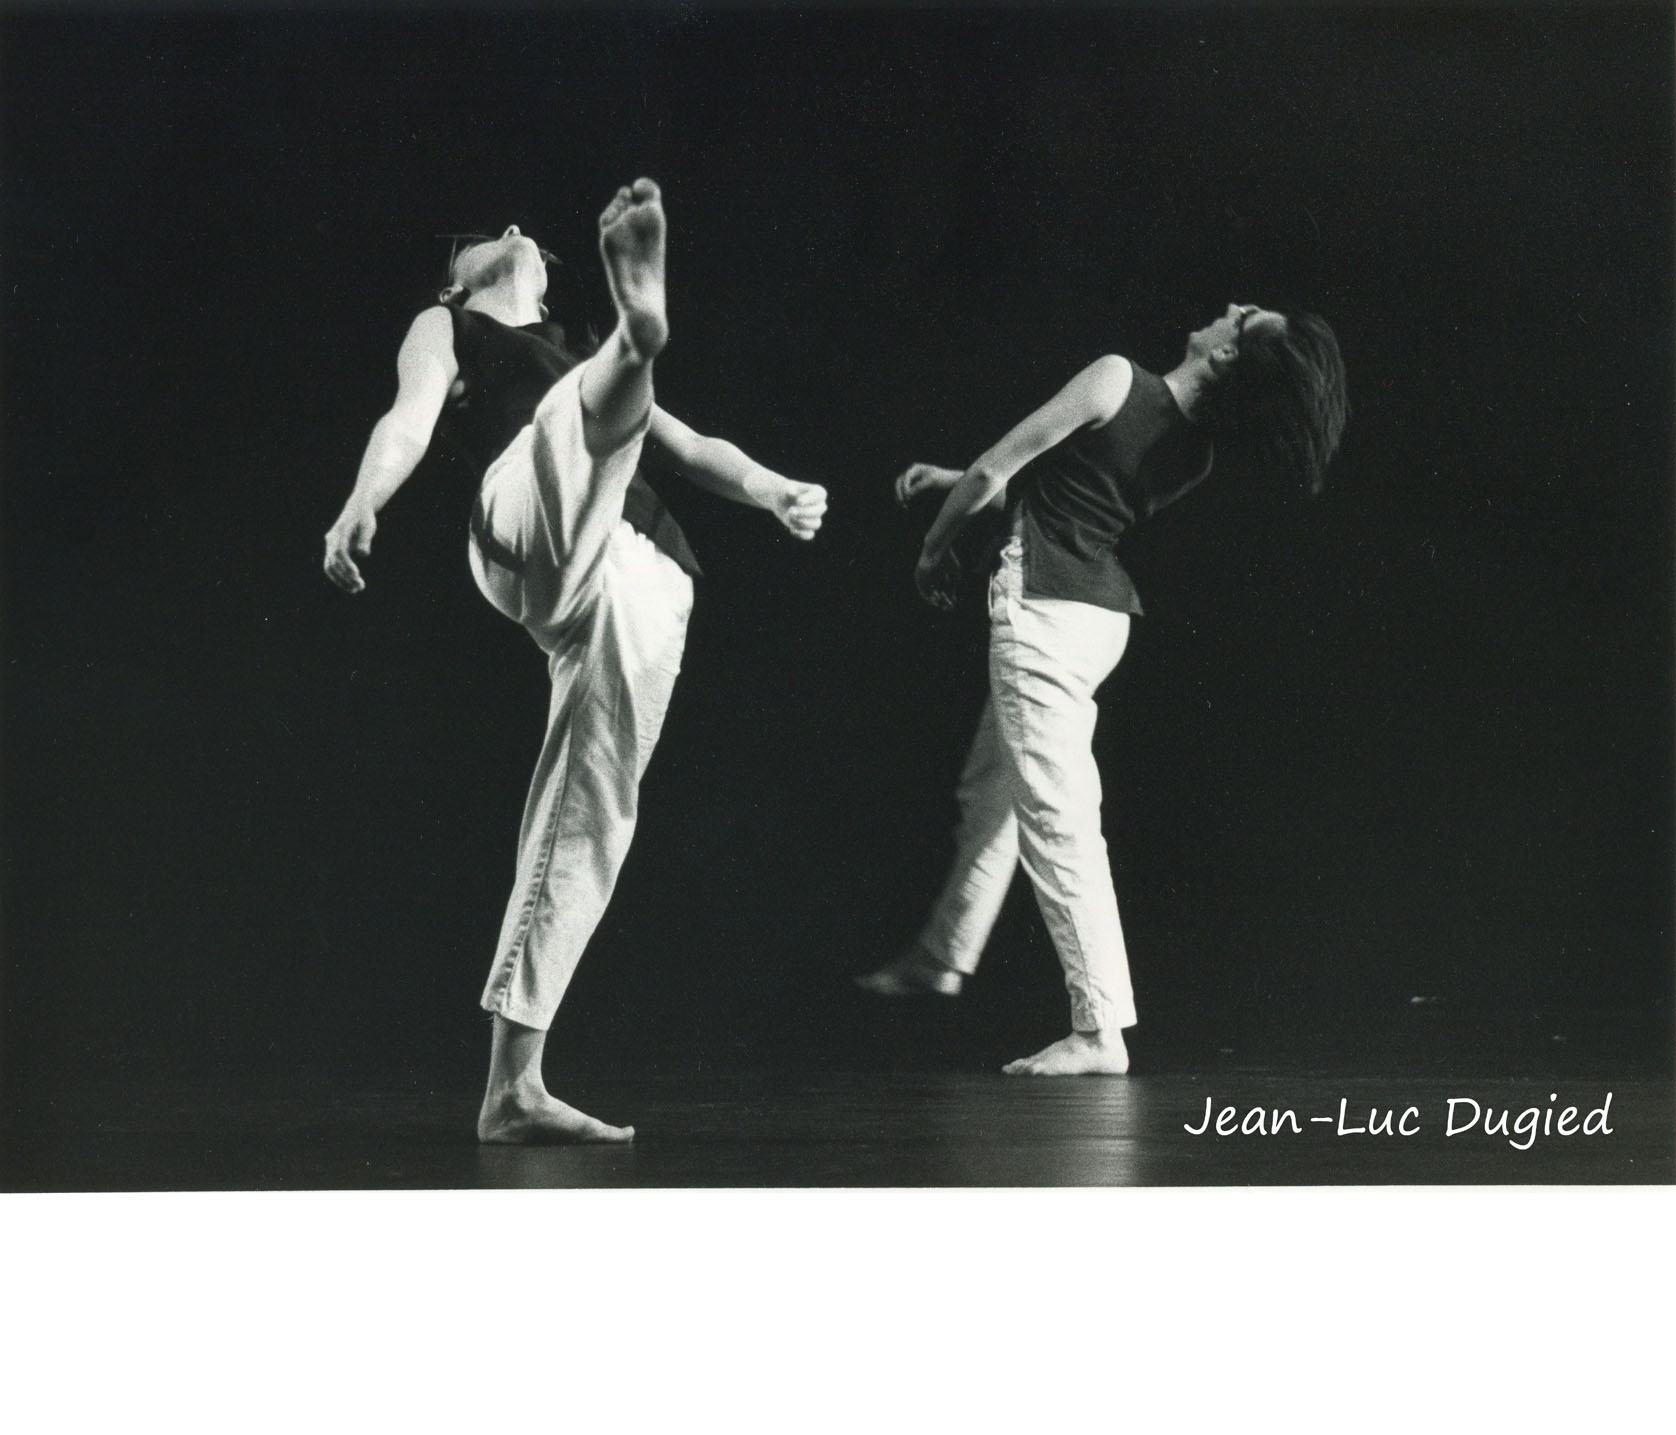 17 Delaporte Charlotte - sogni d'oro - Myriam Seiller et Cécile Borne - 1985